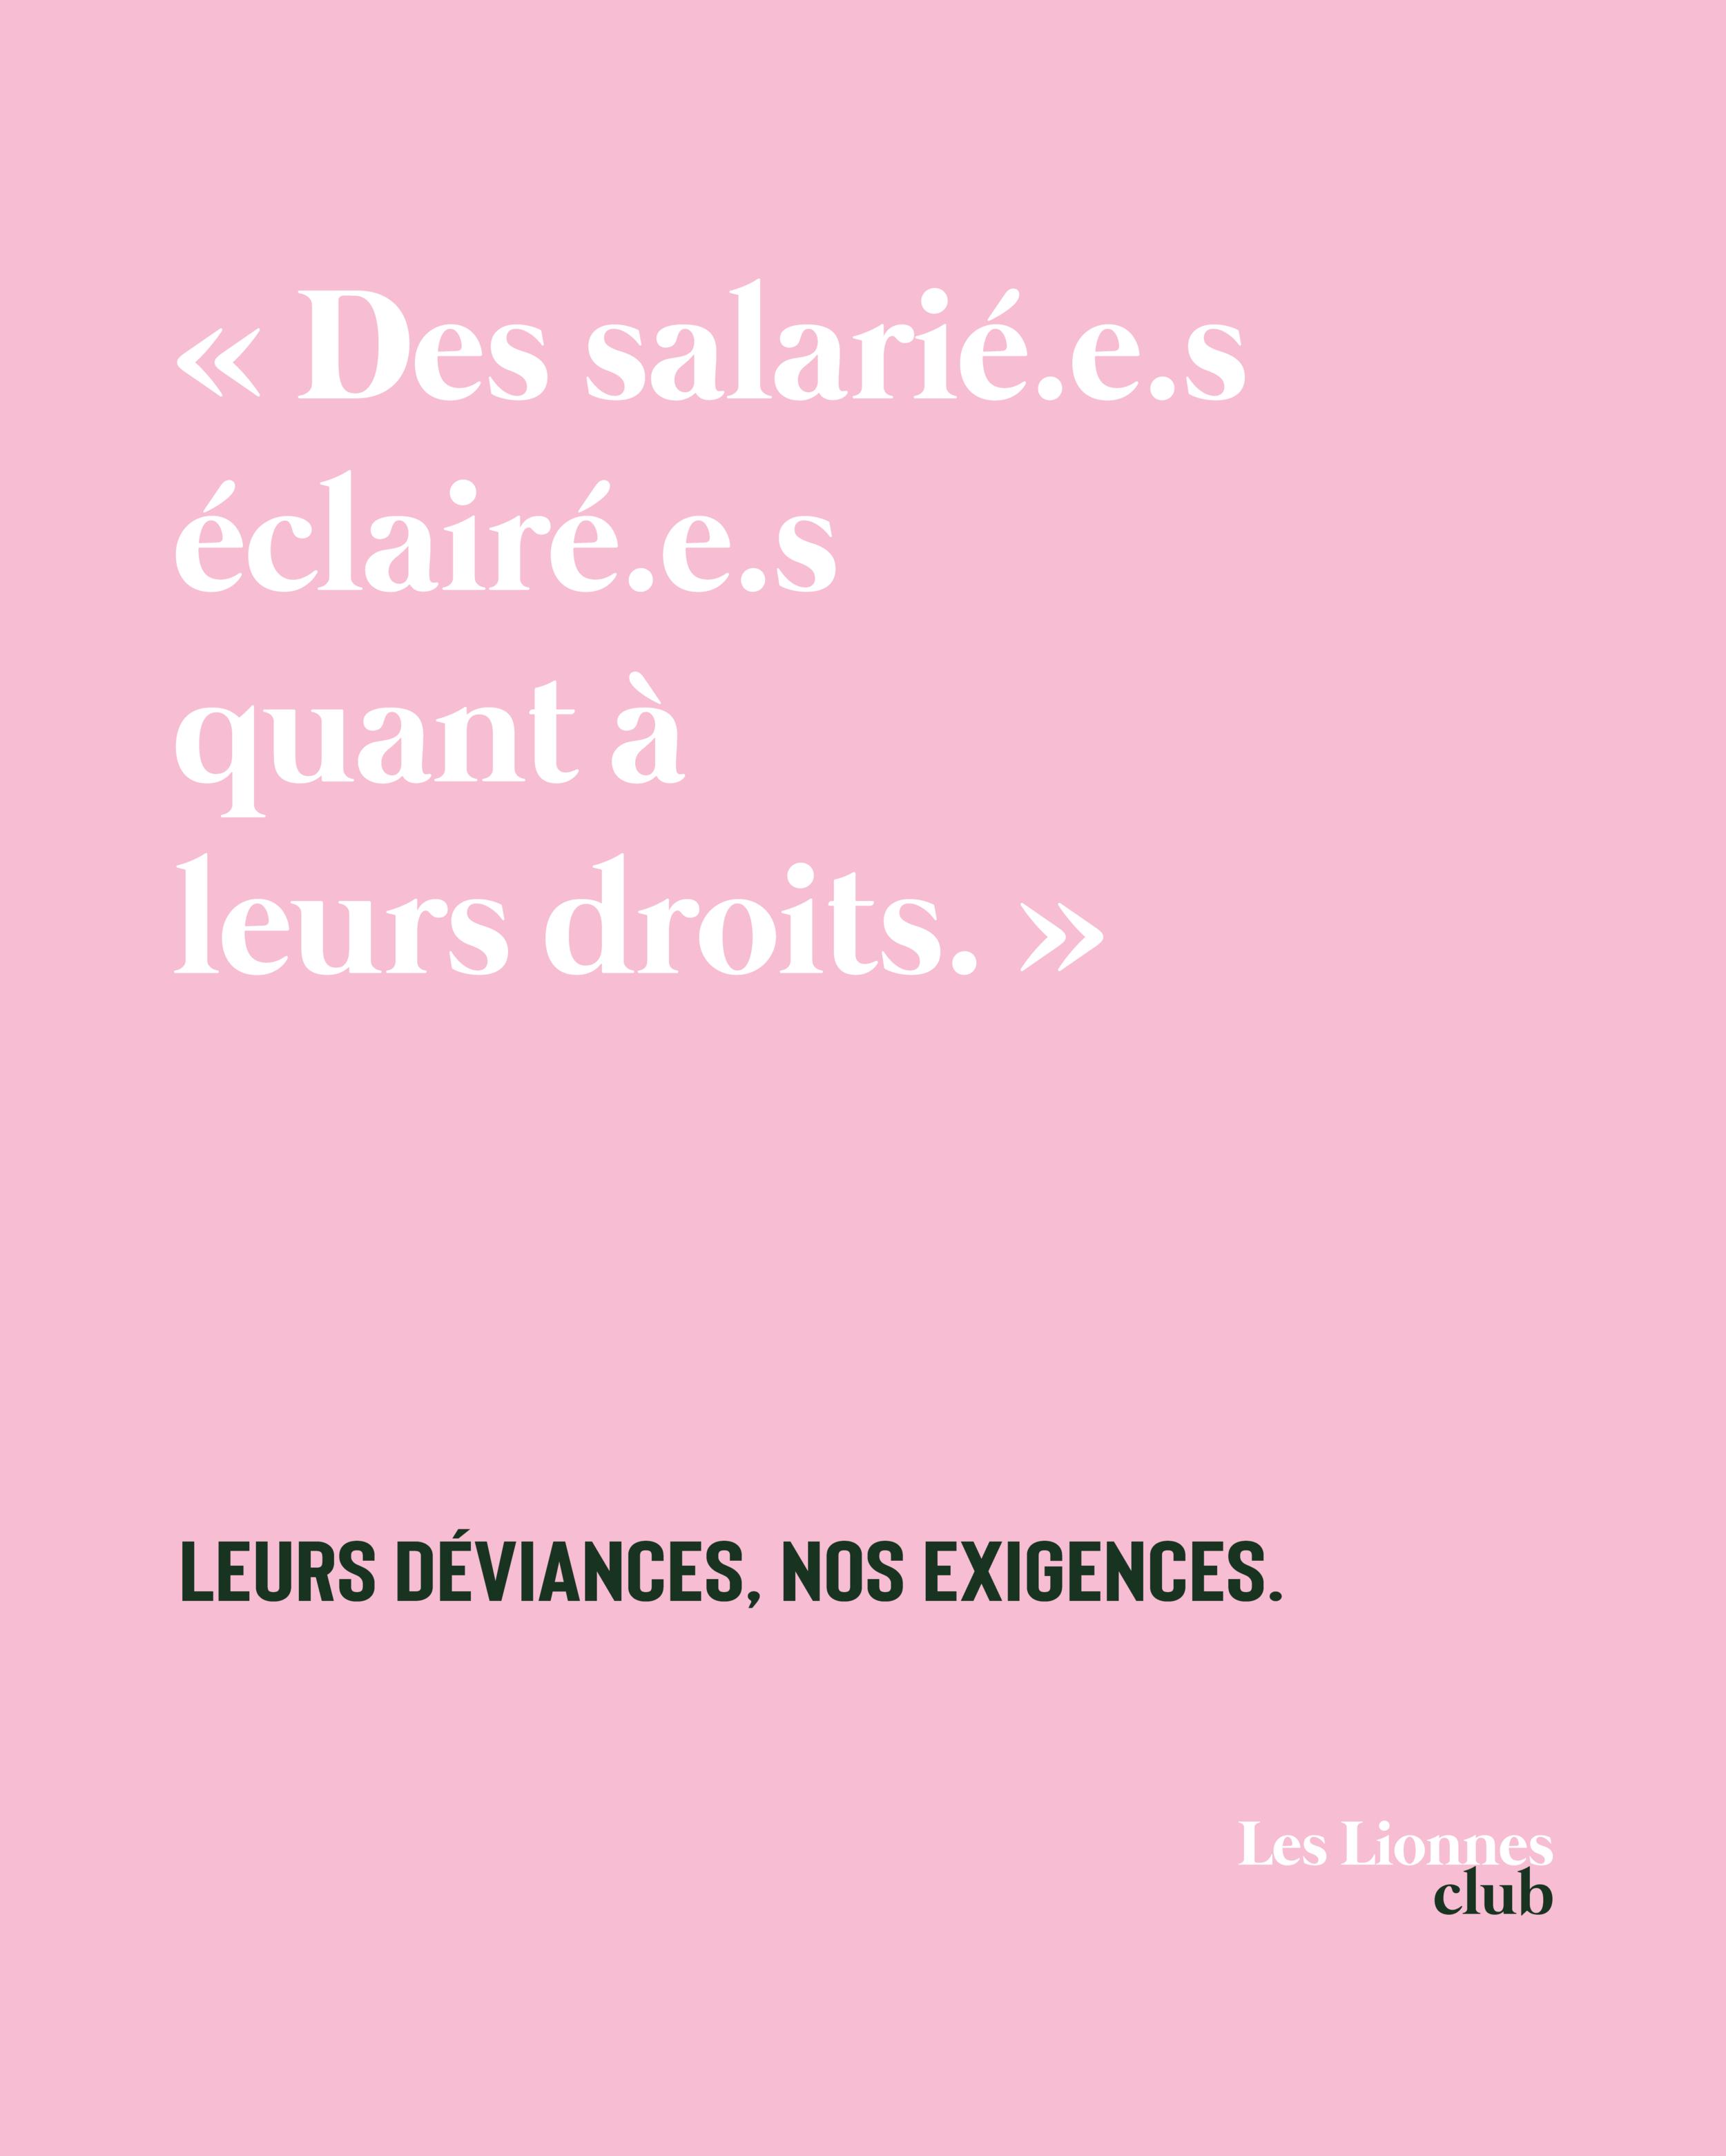 Salarié.e.s_fr INSTA (bis).png